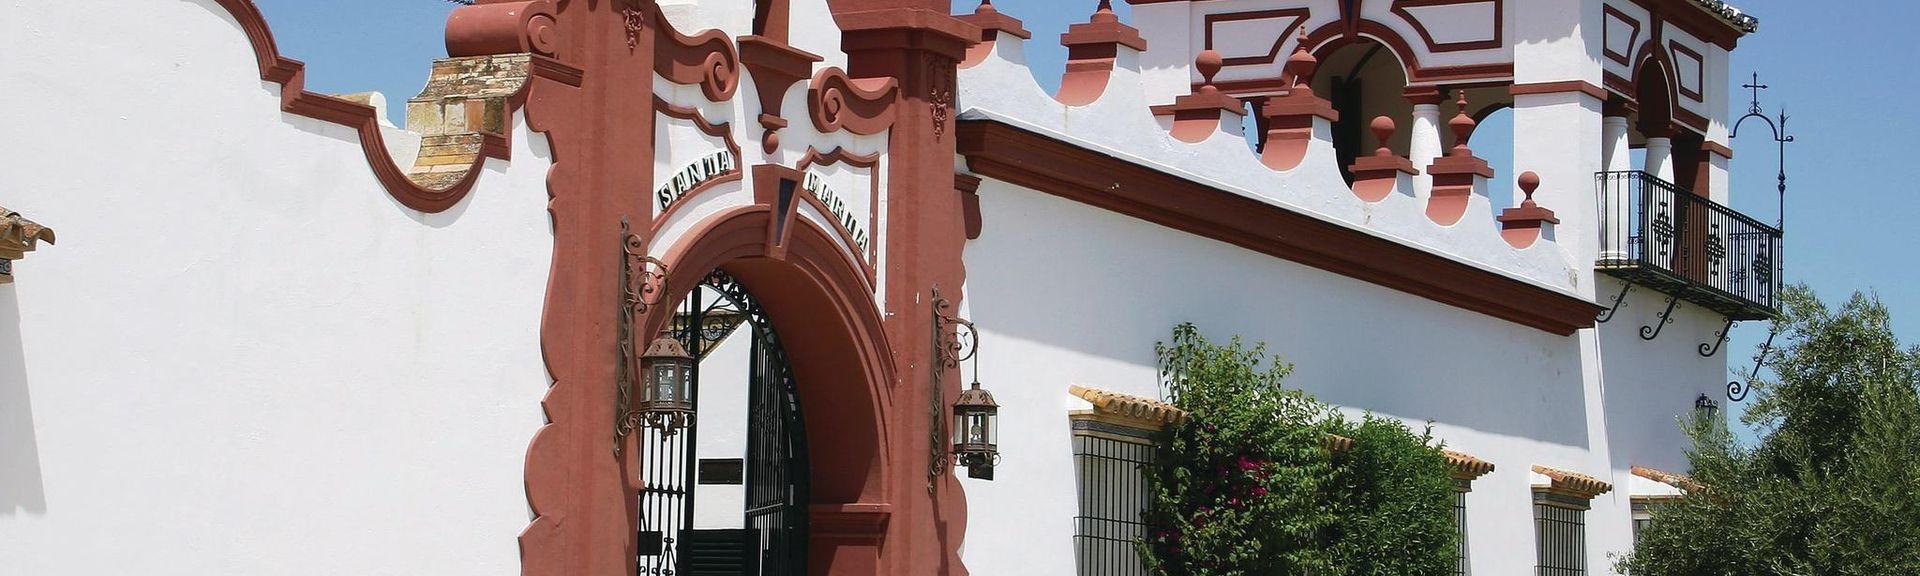 Zufre, Andalousie, Espagne